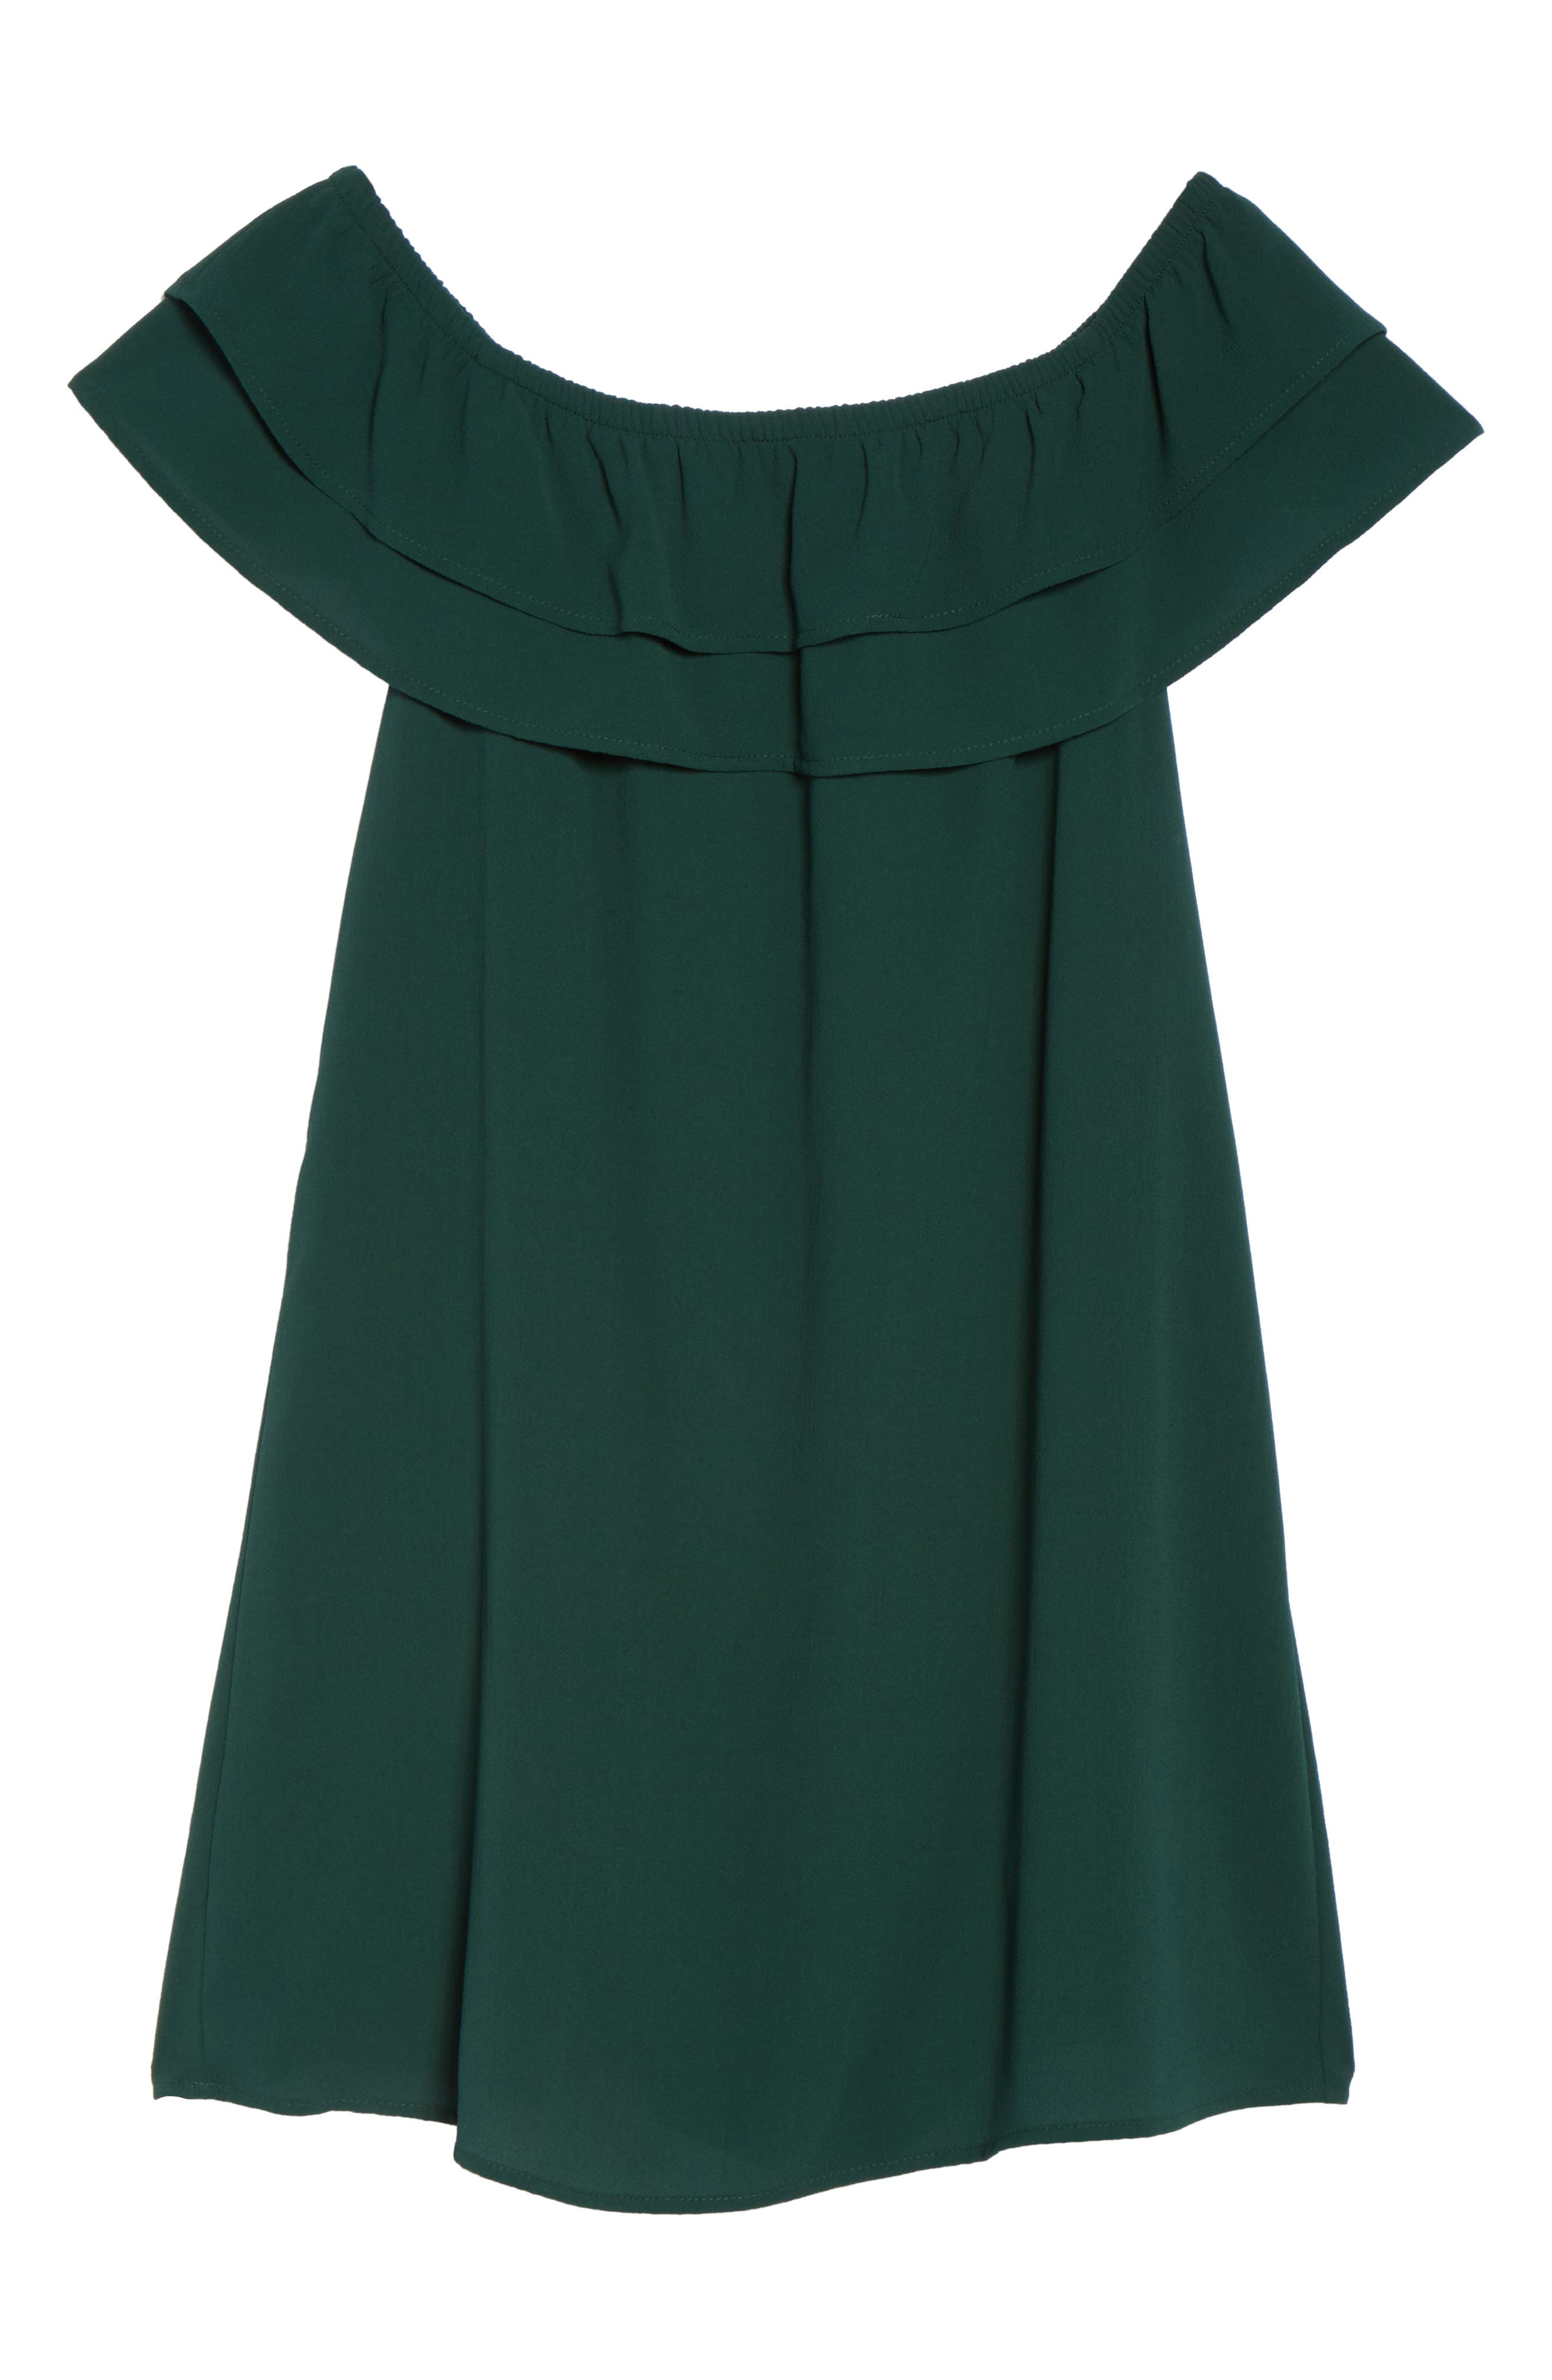 Off the Shoulder Ruffle Dress,                             Alternate thumbnail 6, color,                             301